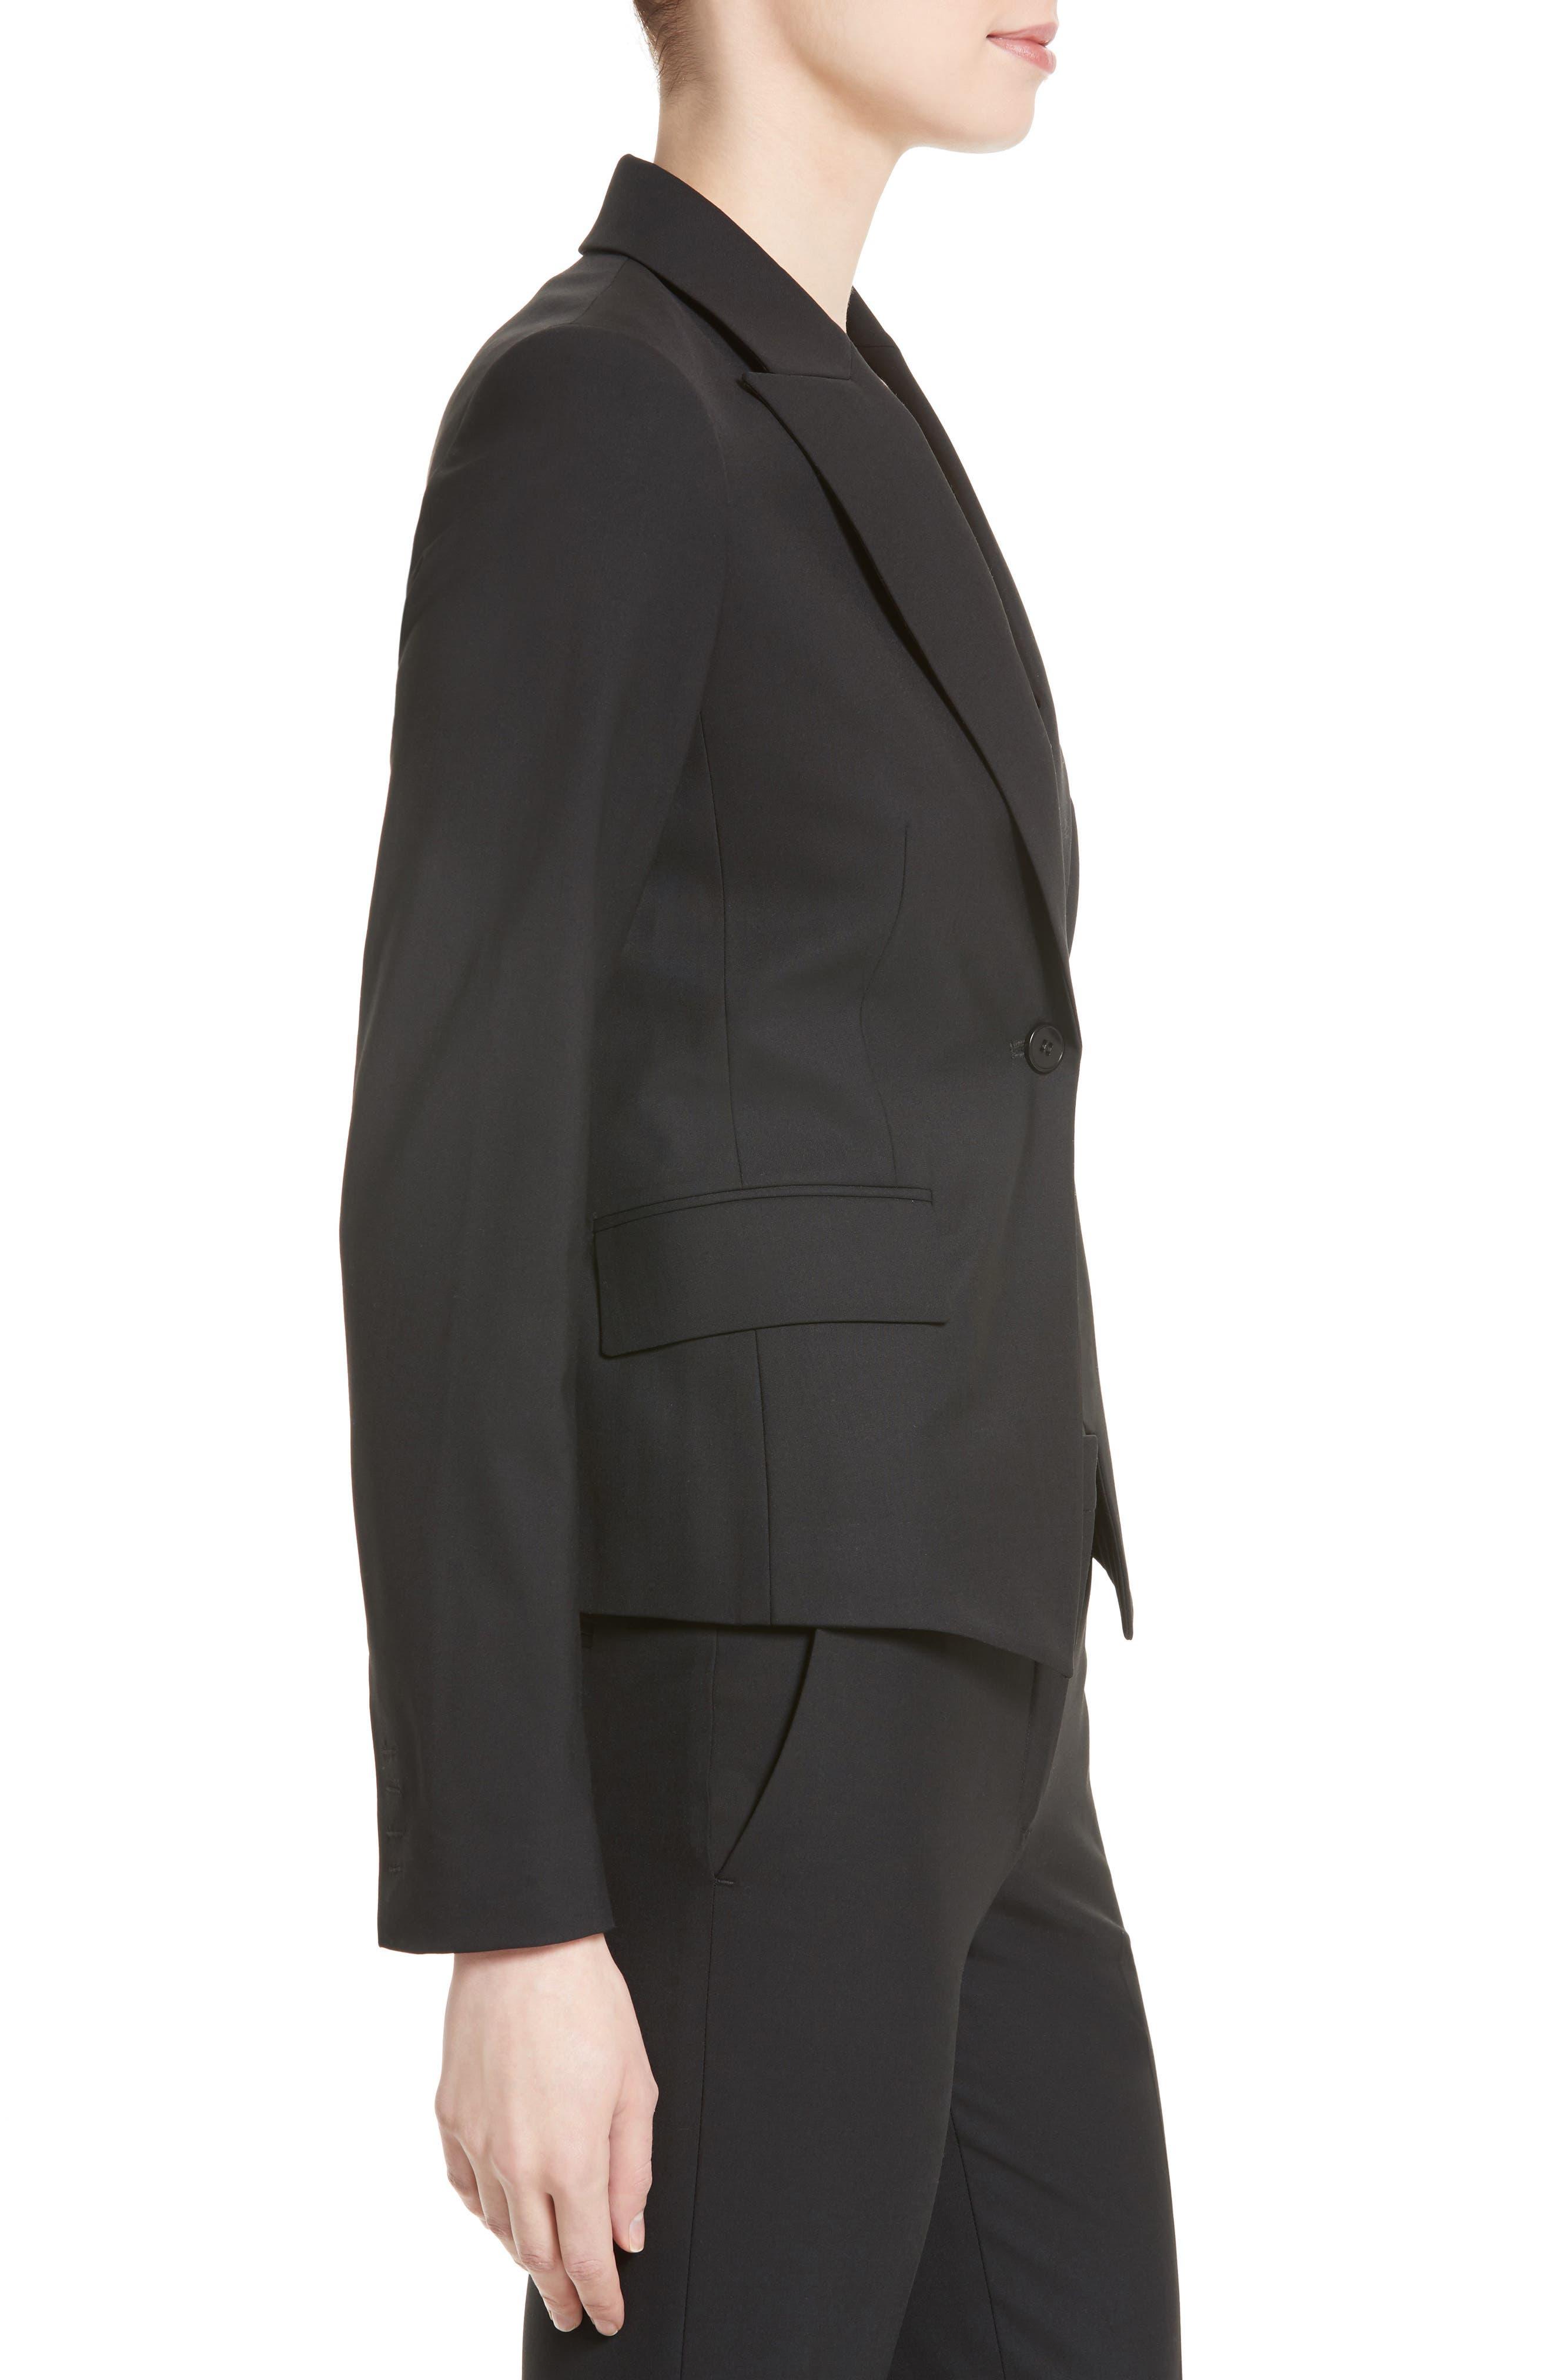 THEORY, Brince B Good Wool Suit Jacket, Alternate thumbnail 4, color, BLACK